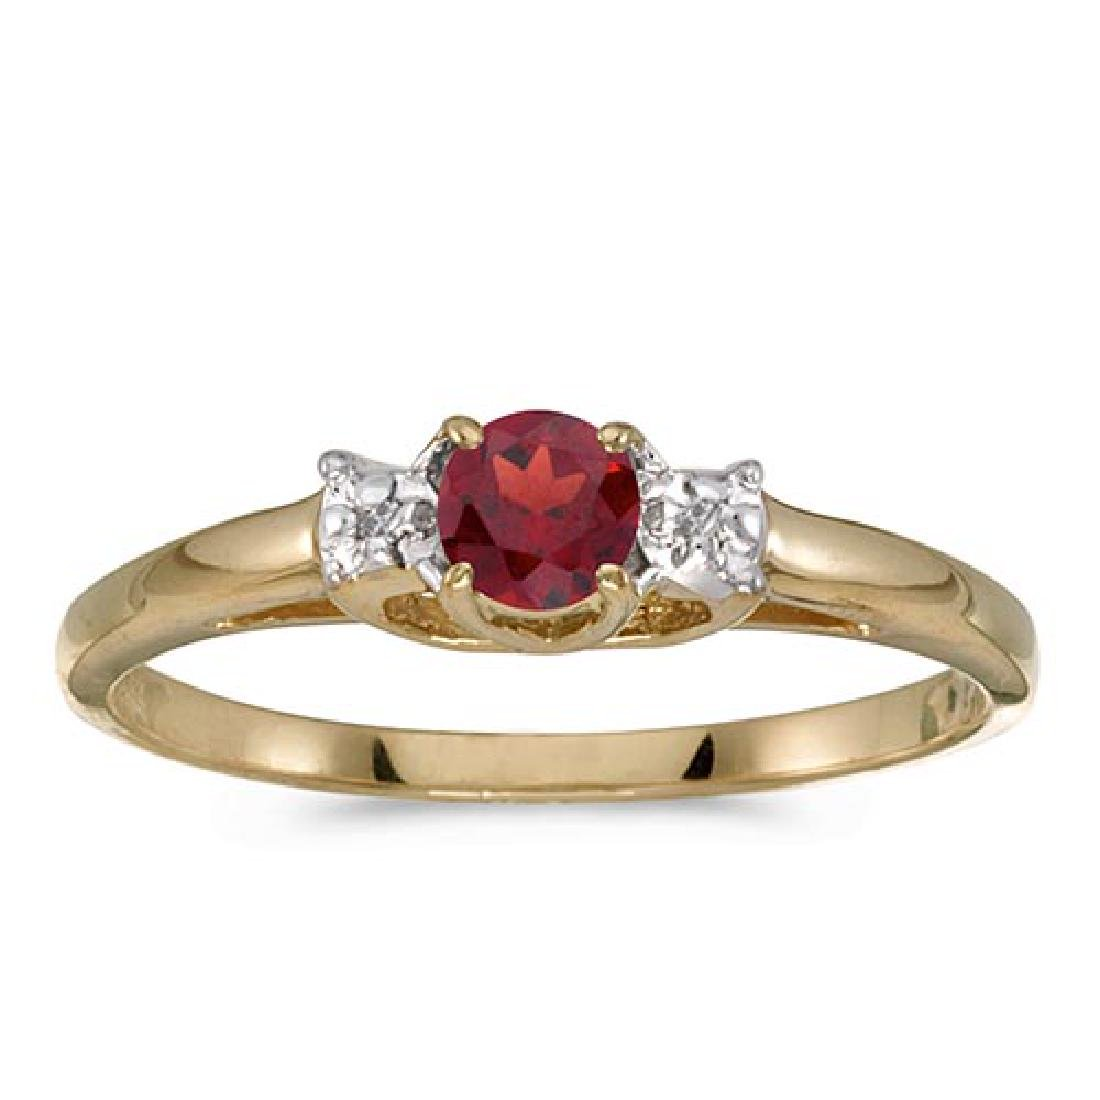 Certified 10k Yellow Gold Round Garnet And Diamond Ring